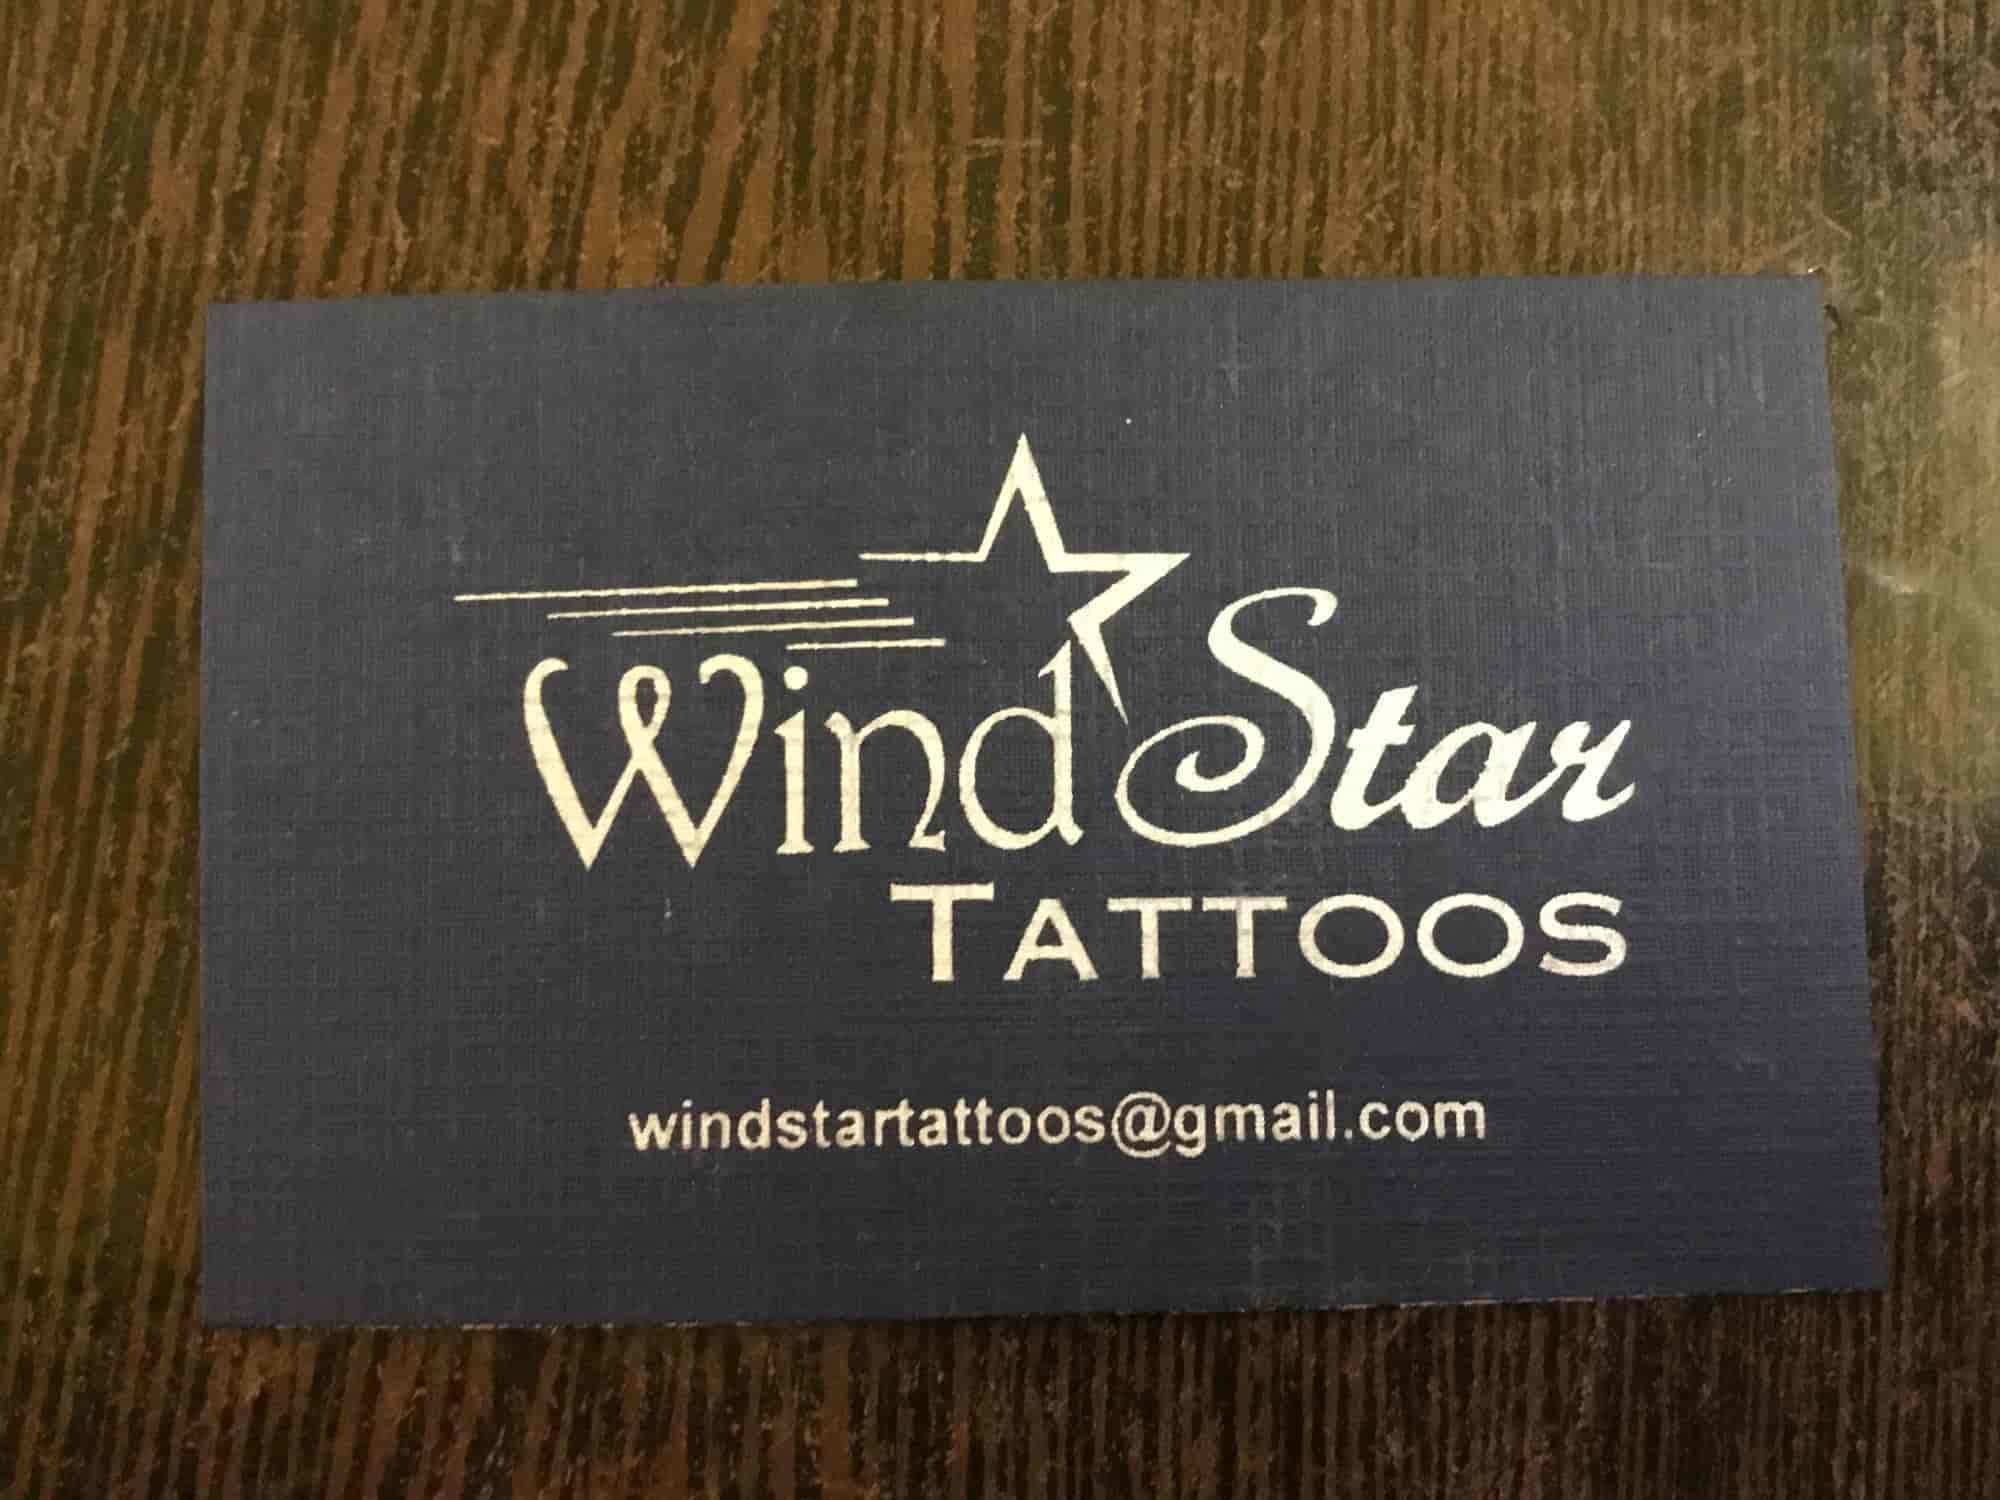 Wind star tattoos kamla nagar wind star tattos tattoo artists wind star tattoos kamla nagar wind star tattos tattoo artists in delhi justdial magicingreecefo Image collections